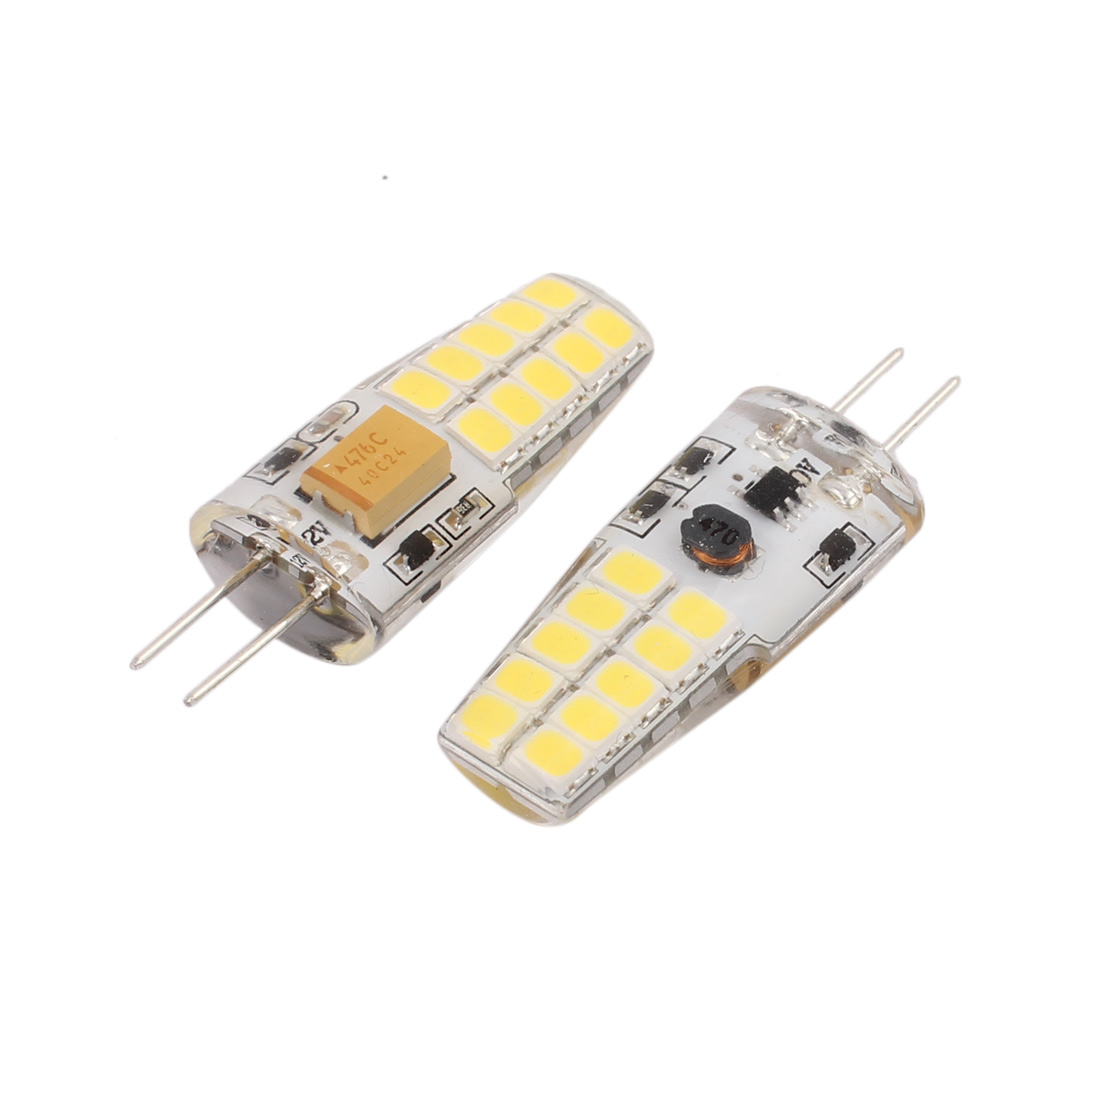 2 Pcs /DC12V 4W SMD  Light Bulb Silicone Lamp 20- G4 2835 Cold White - image 2 de 2